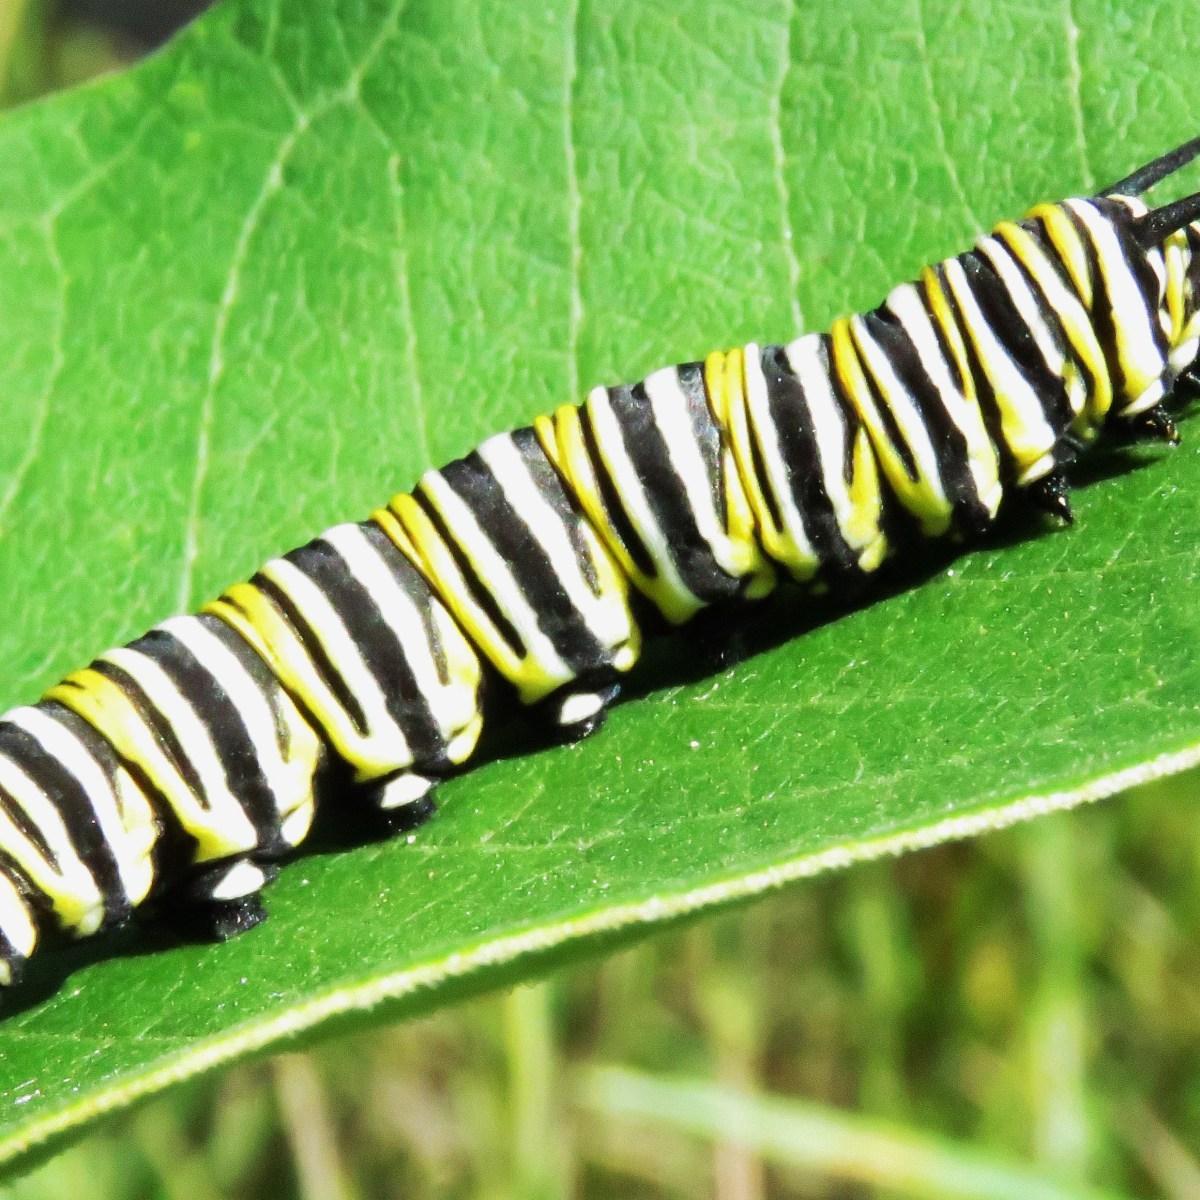 A monarch caterpillar crawls along a green leaf